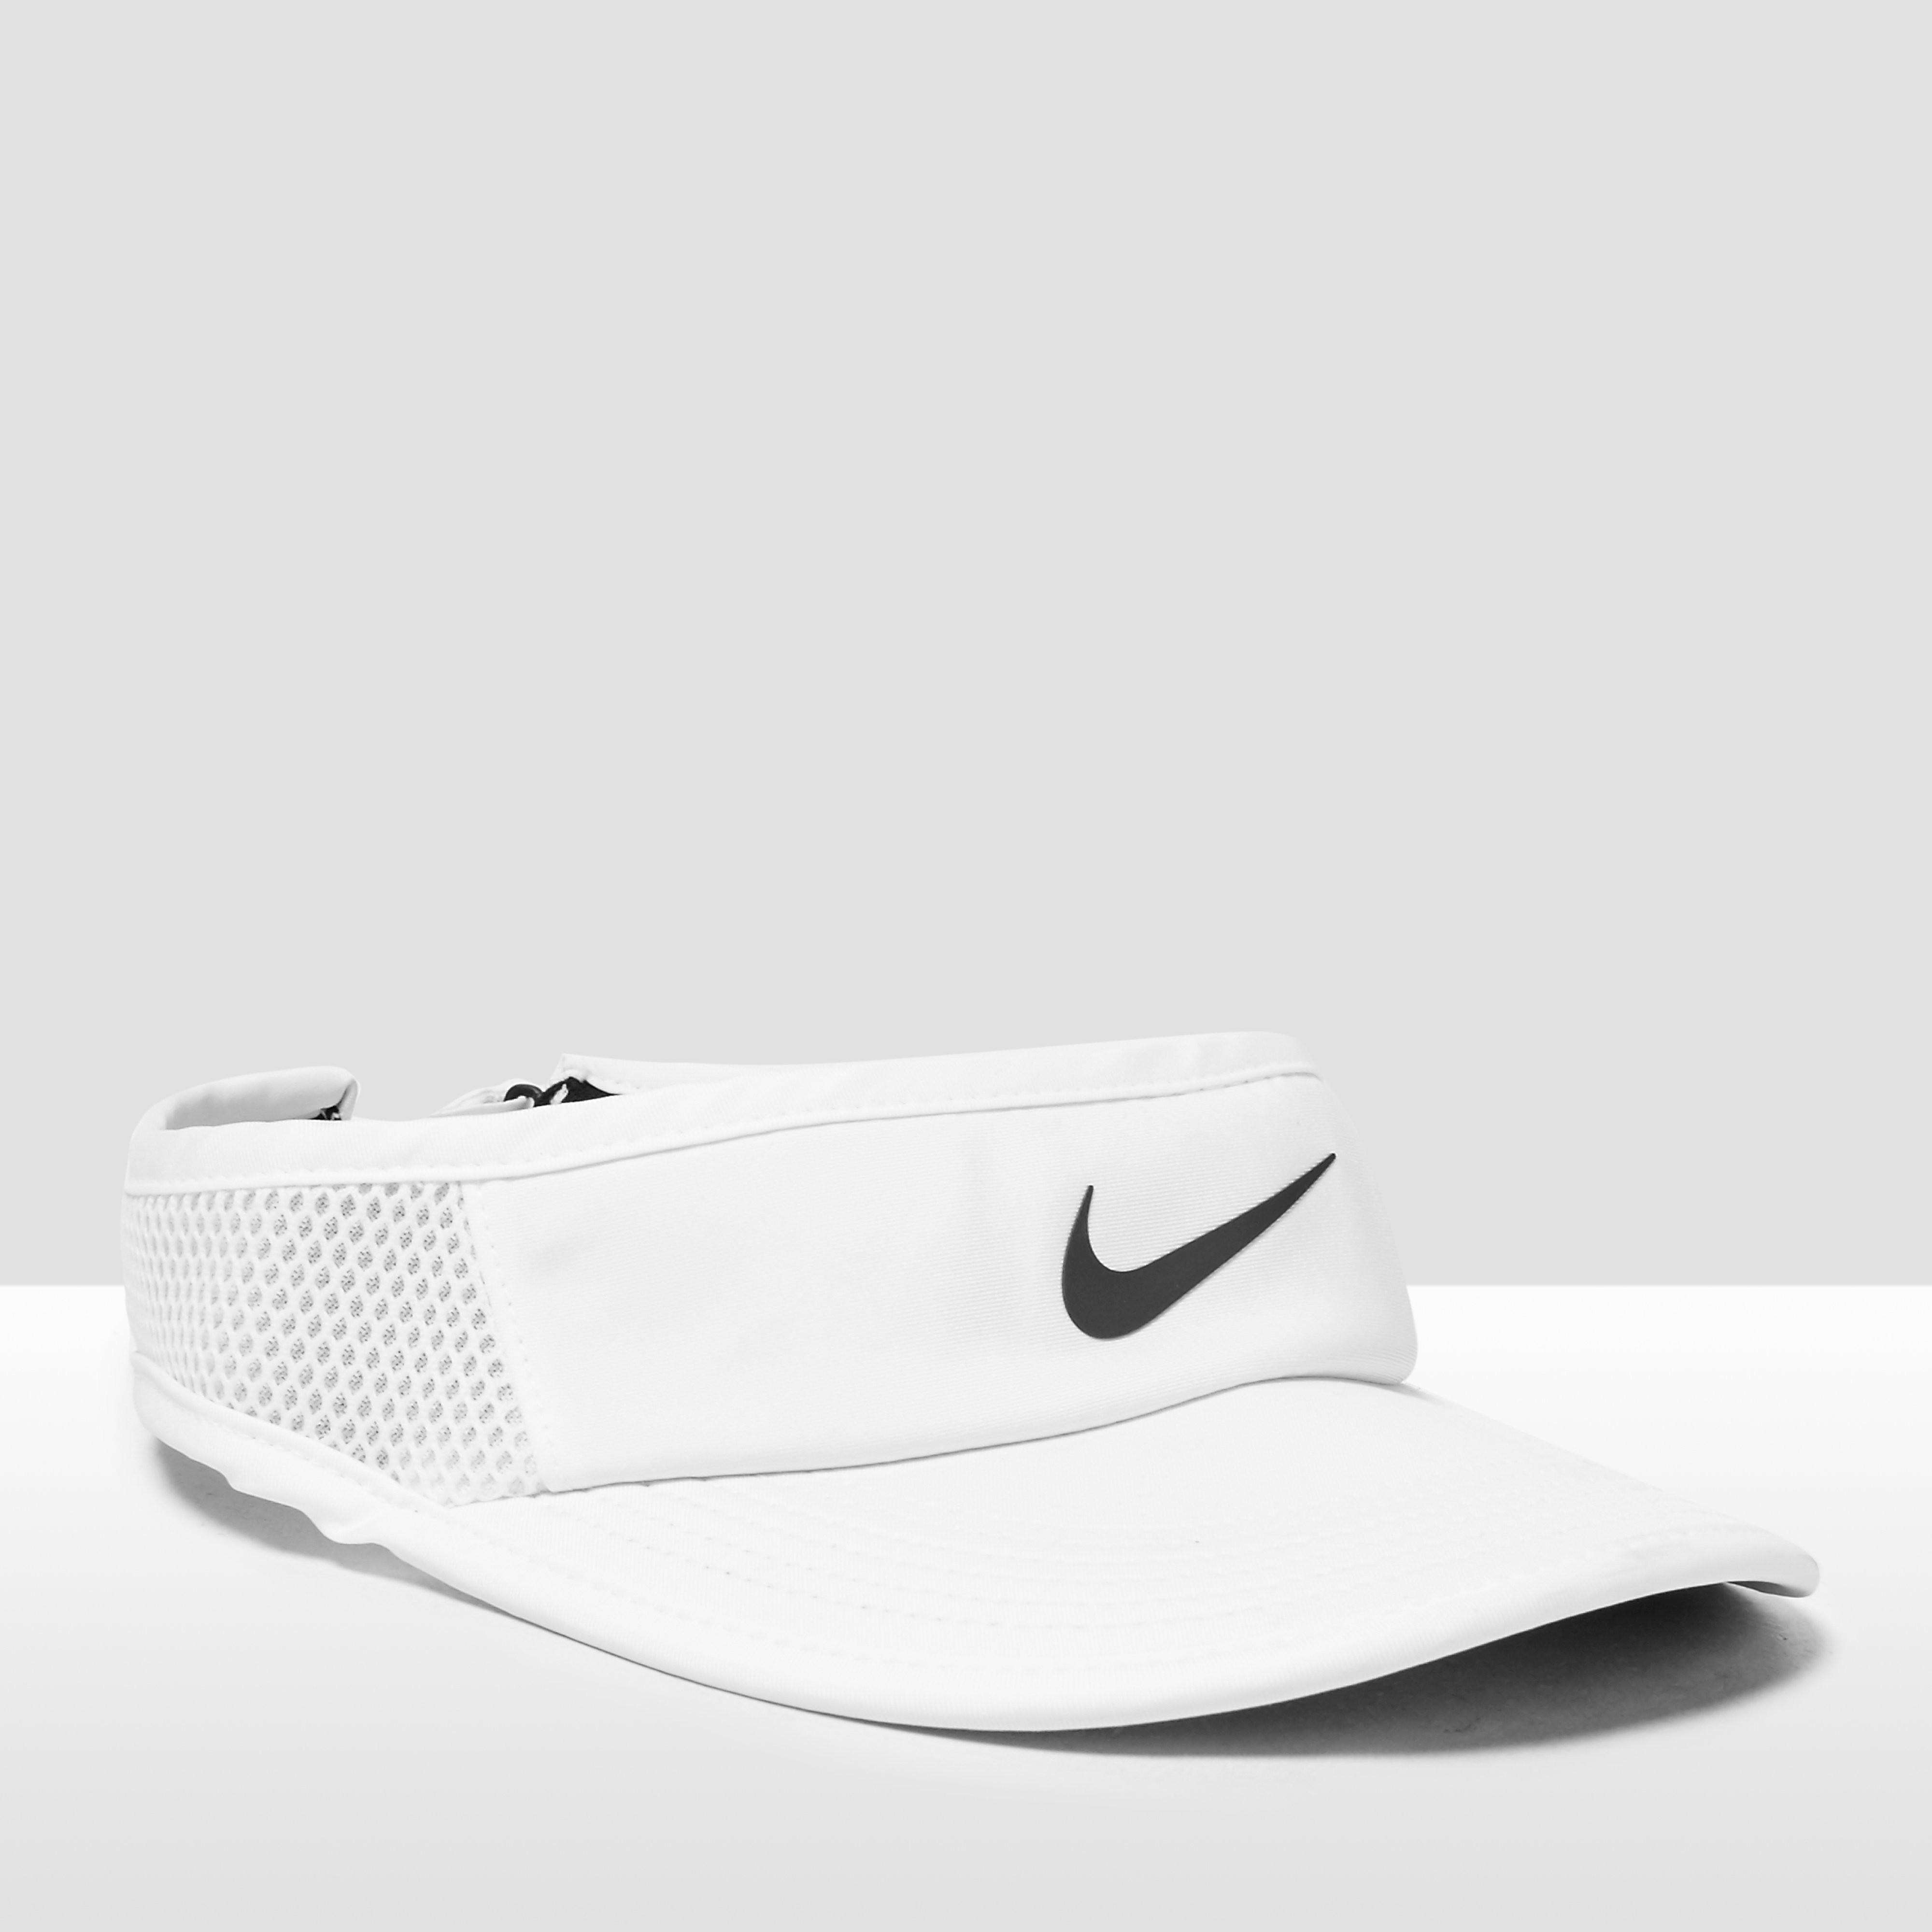 Nike Court Aerobill Women's Tennis Visor